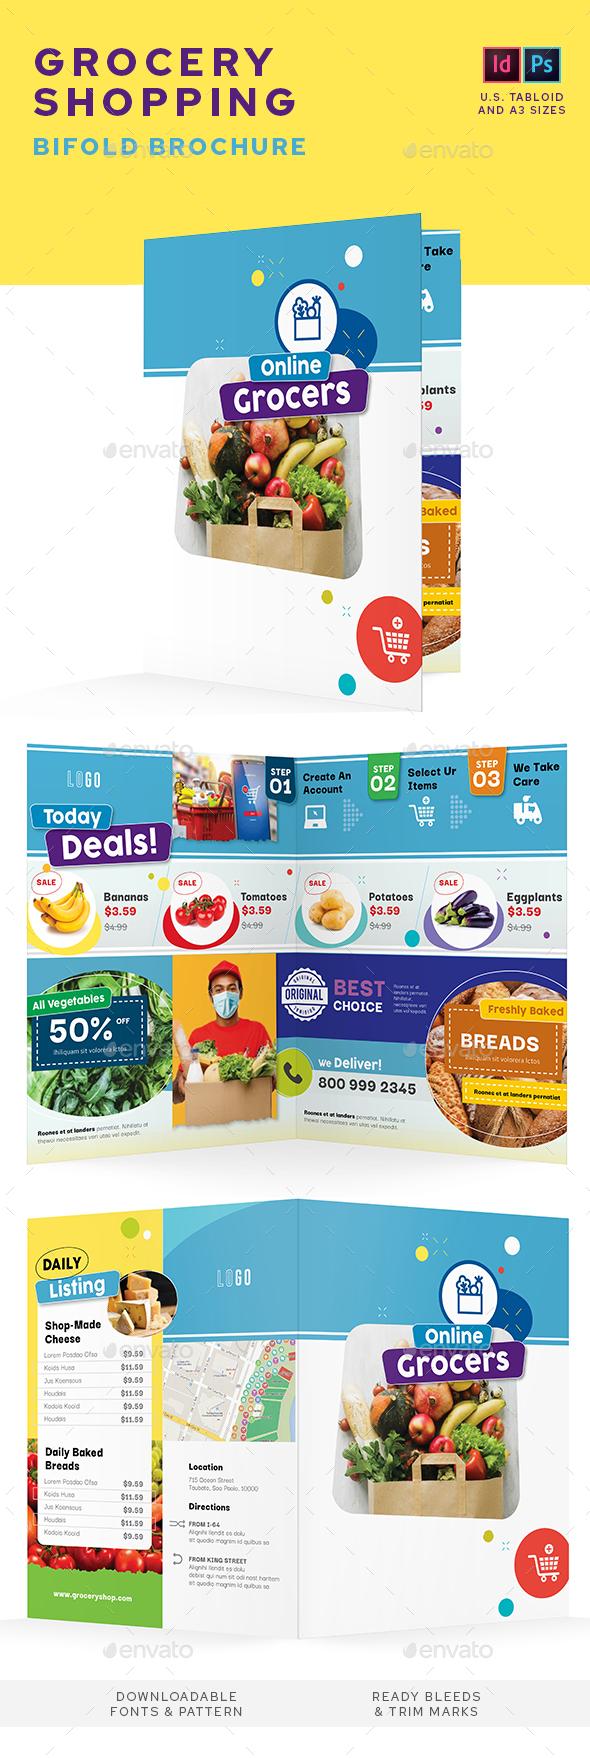 Grocery Shop Bifold Brochure